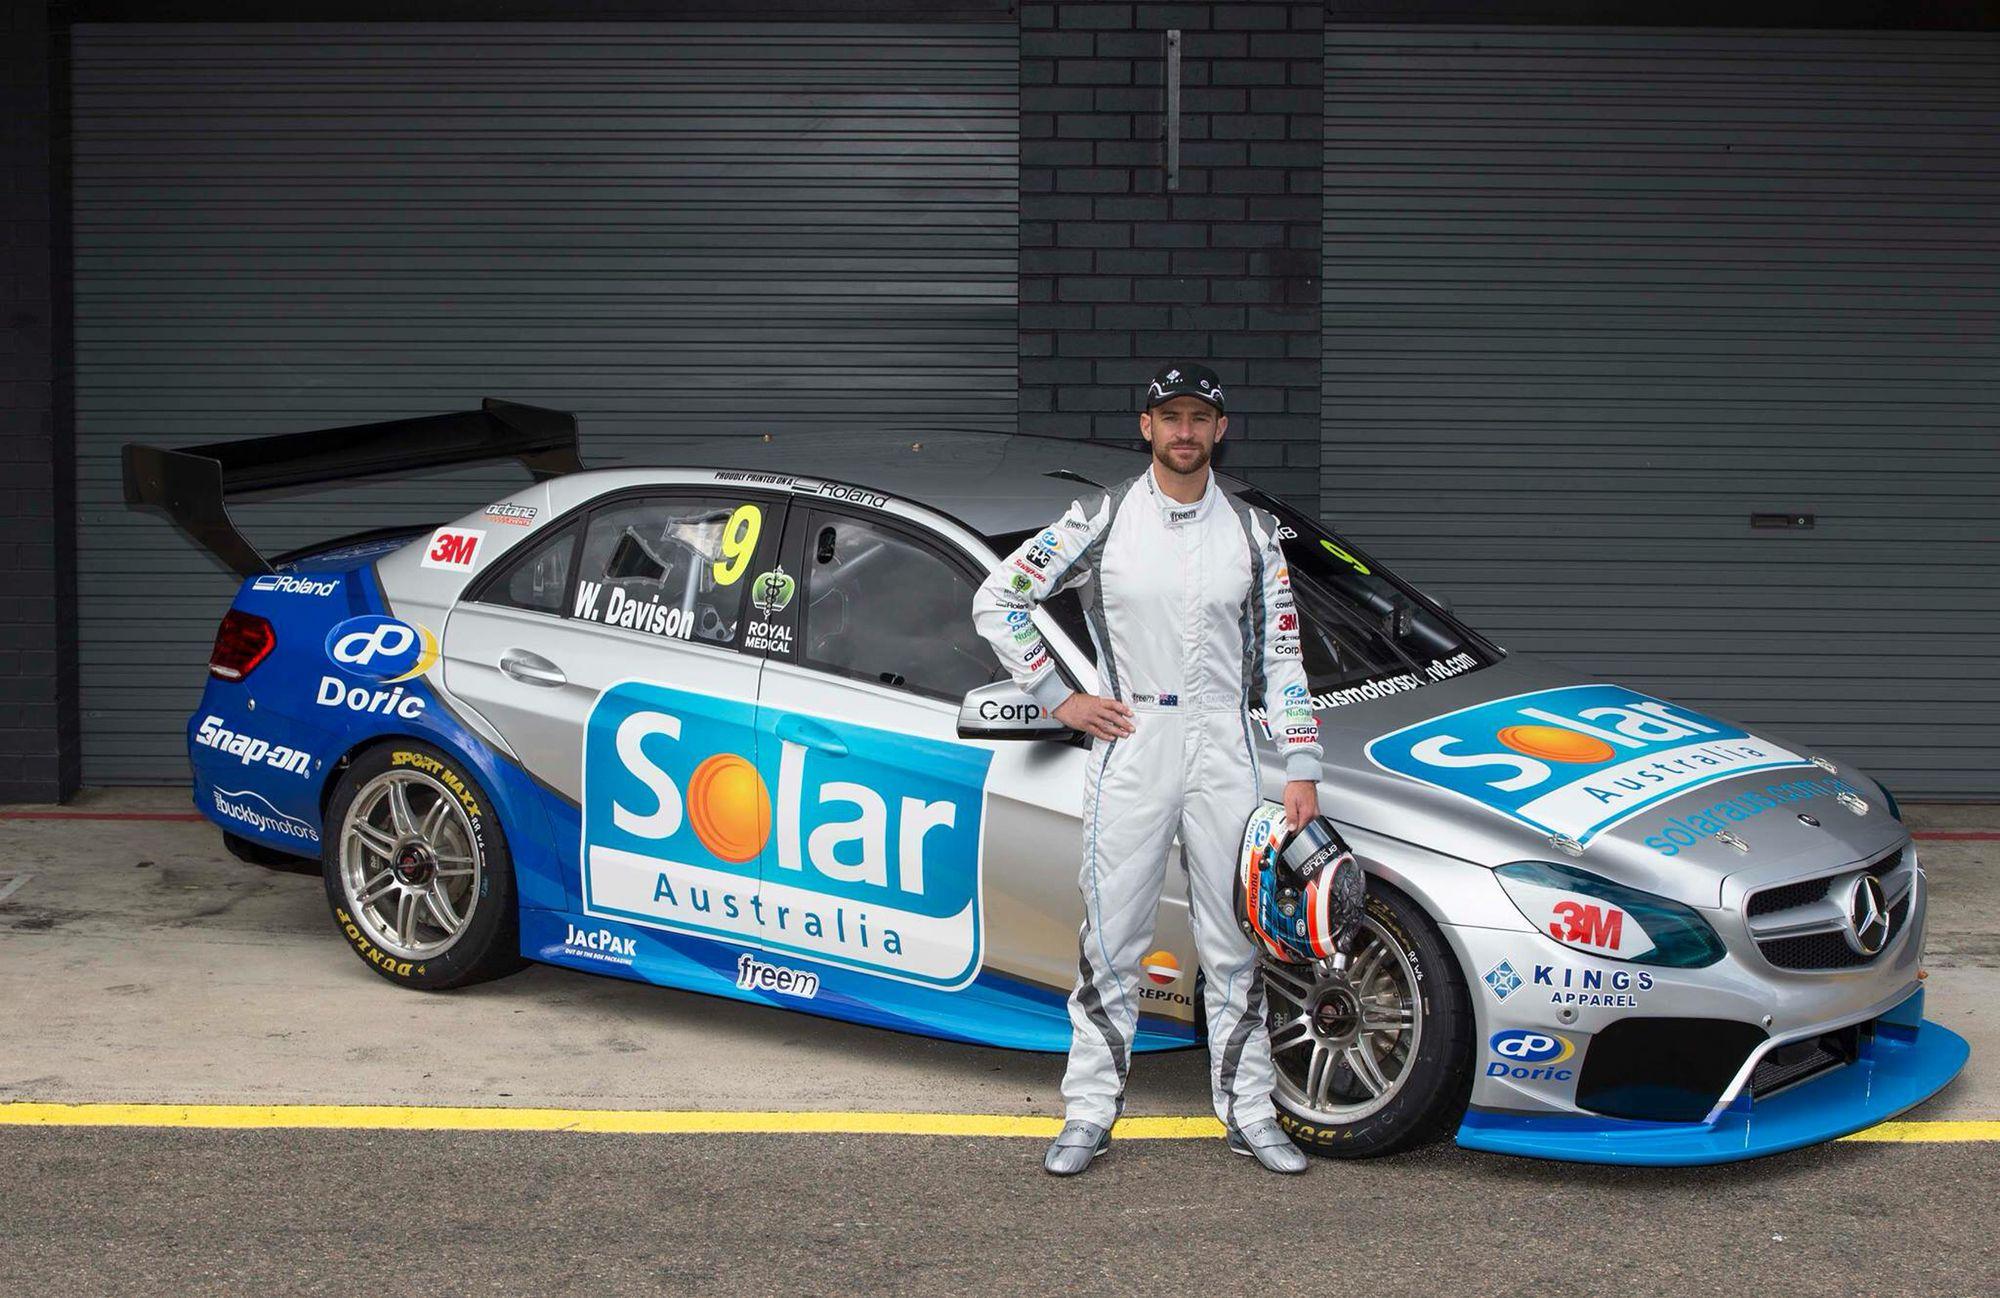 Will Davidson 9 New Car In 2015 V8 Supercars Australia New Cars Super Cars